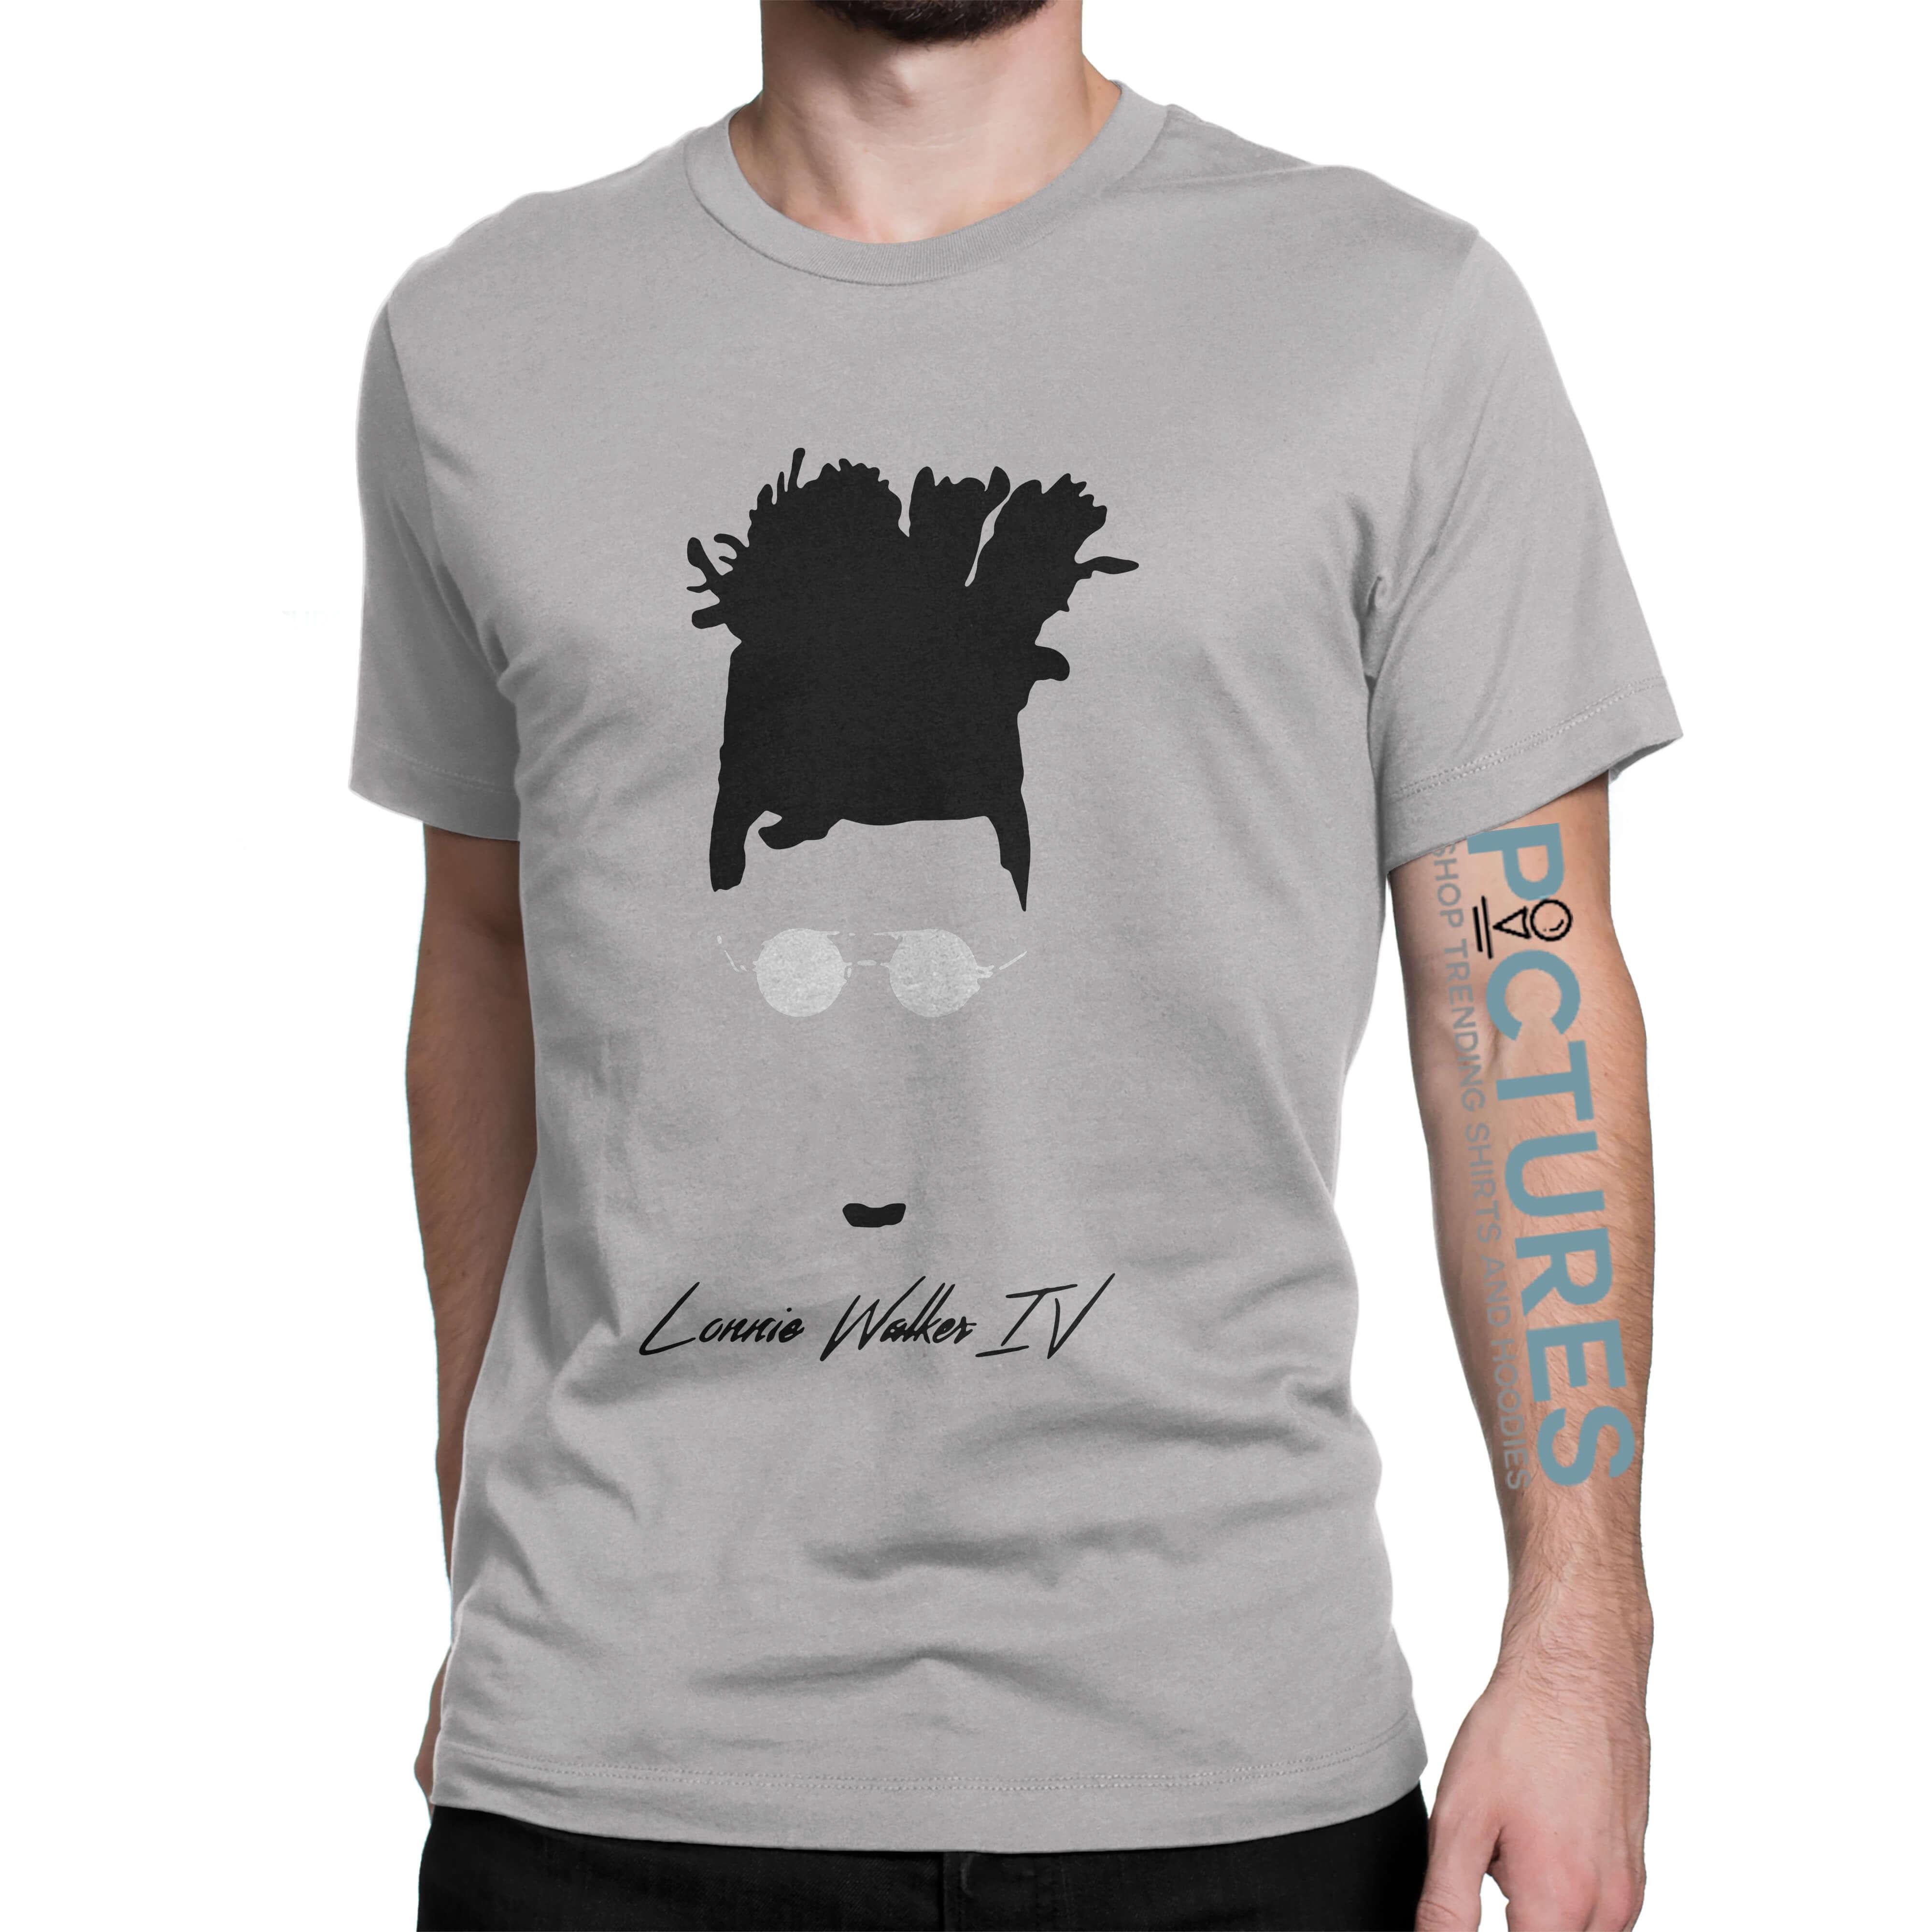 San antonio high hair lonnie walker iv shirt hoodie for Custom shirts san antonio